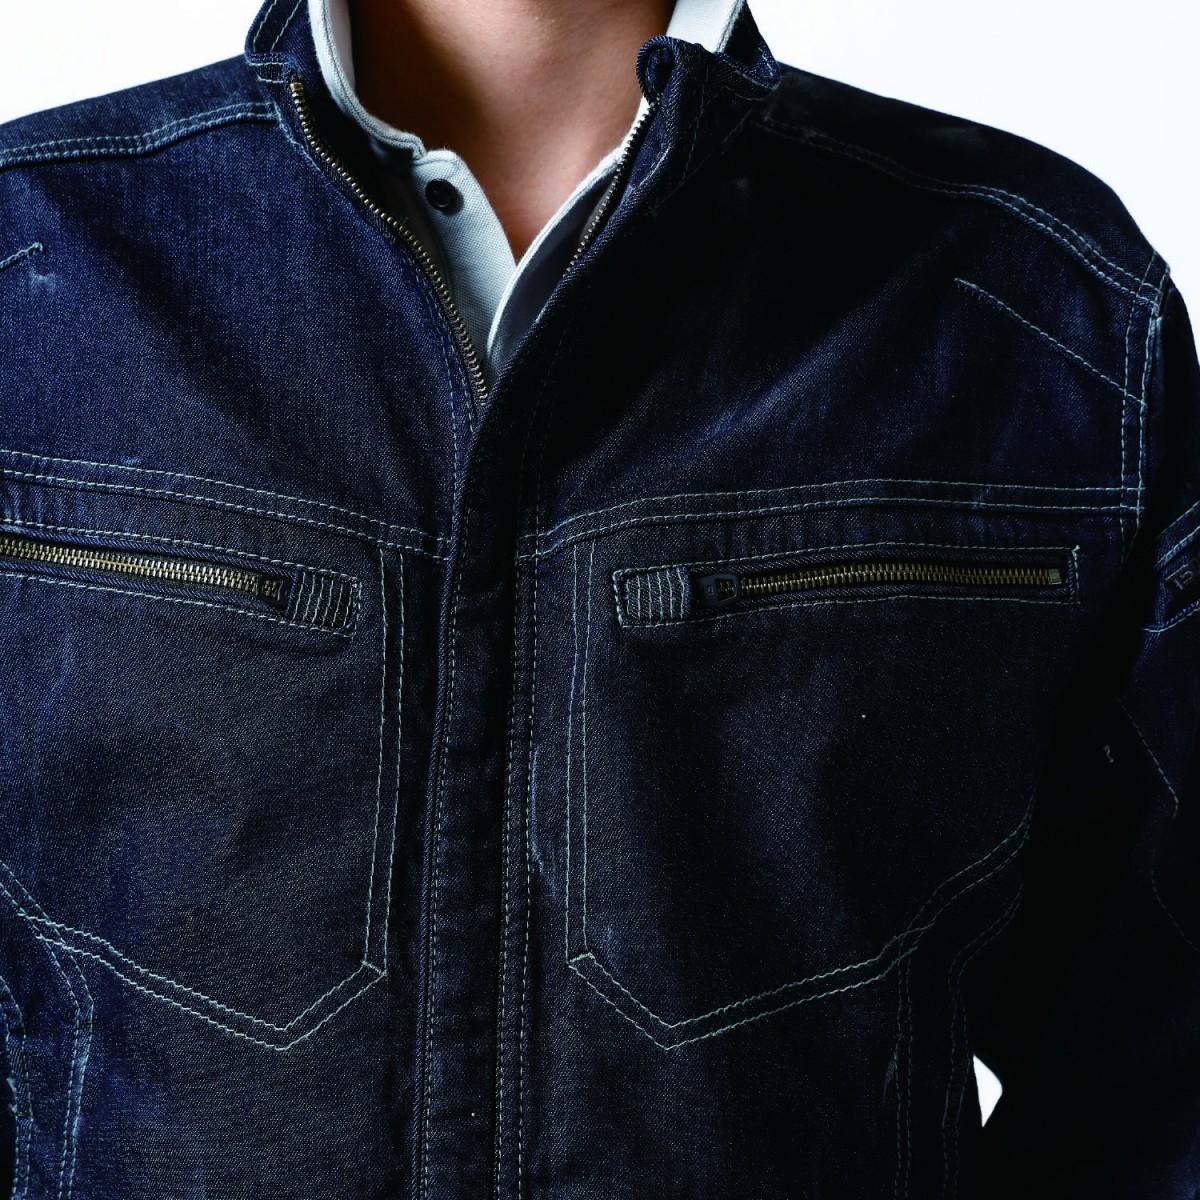 TS DESIGN 5116 ジャケット ¥4,950(税込)大型のファスナー採用。使い易さが違います。